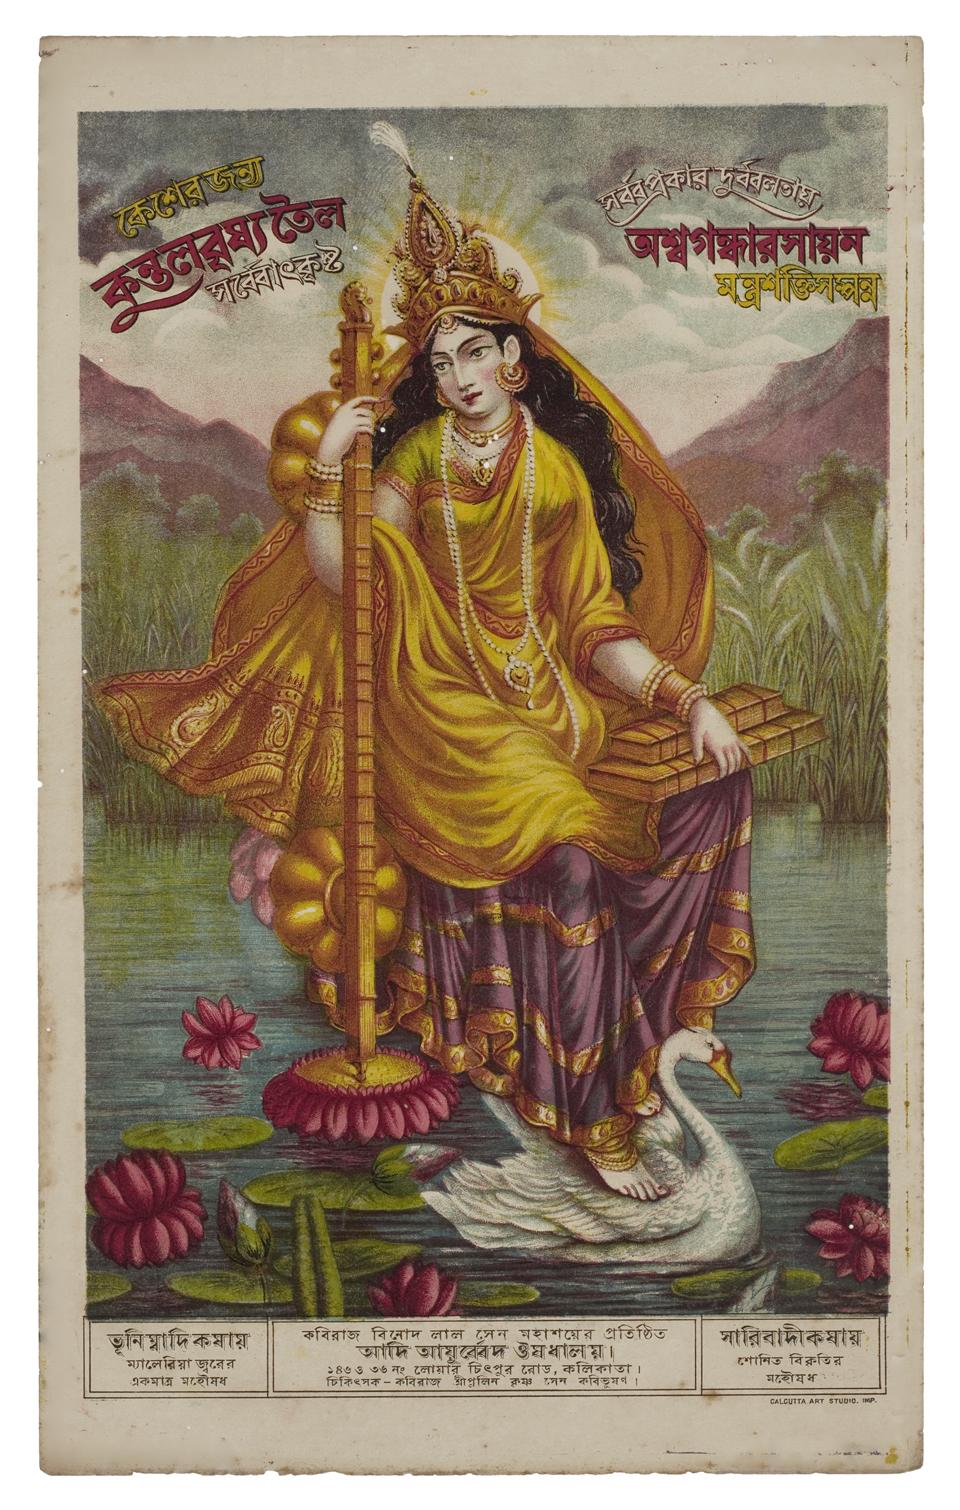 Sarasvati, c. 1885